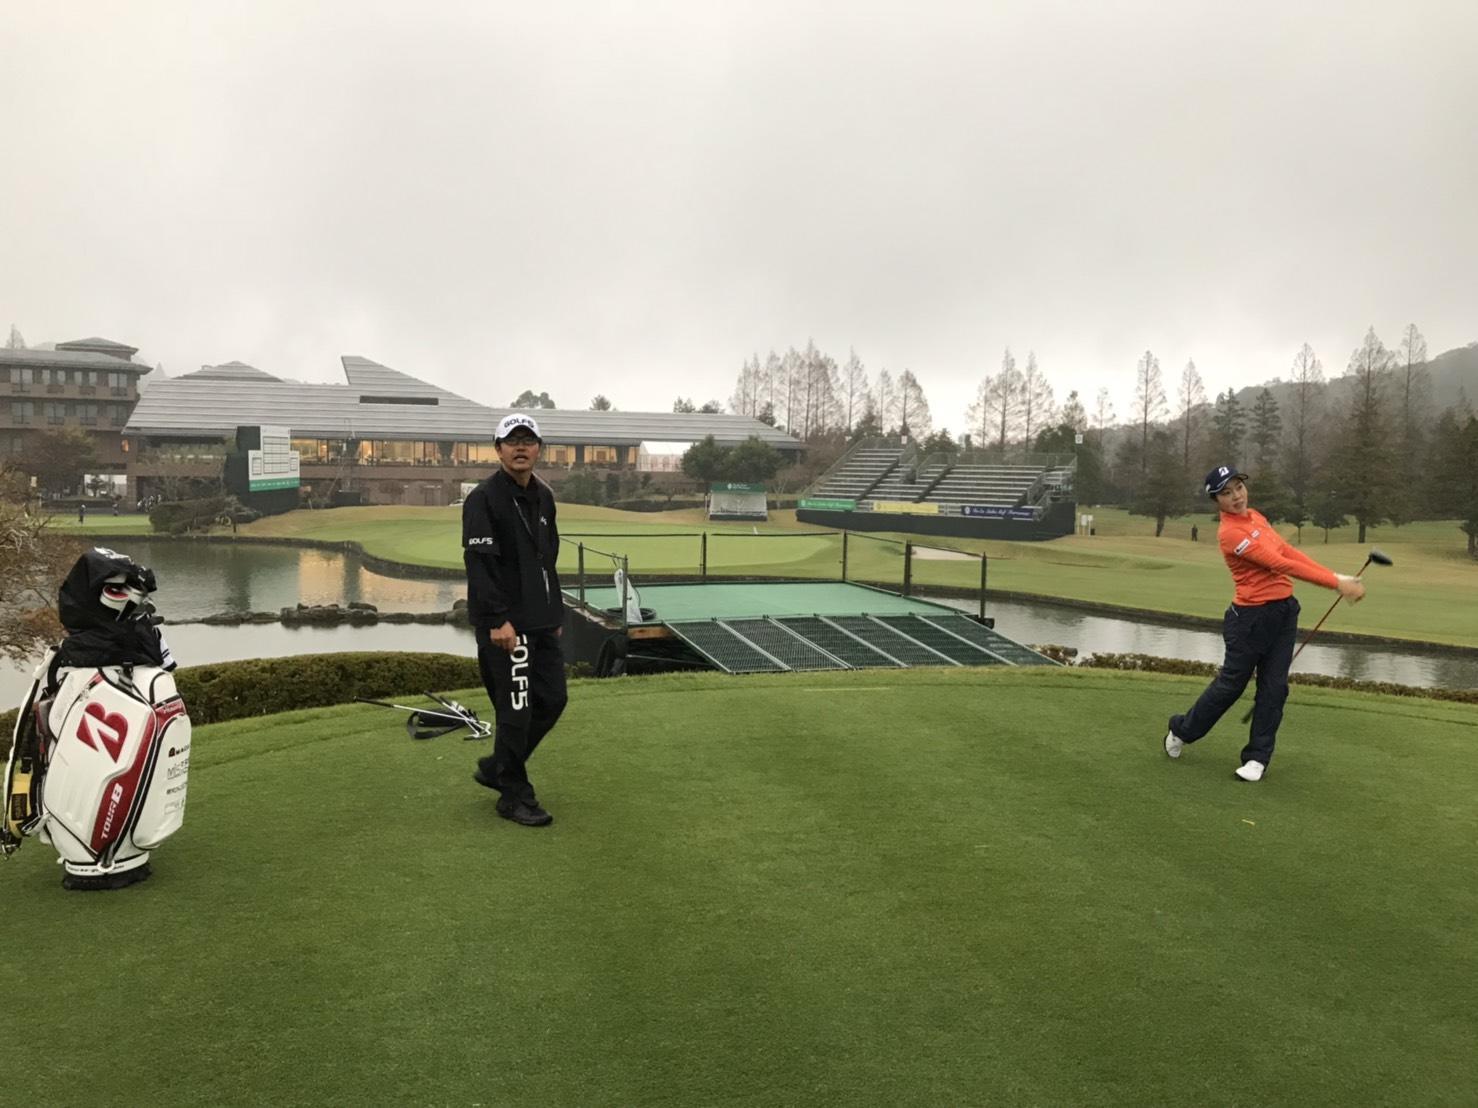 http://www.bs-golf.com/pro/451b18877080405e4ad8e1fe6fd92e67ef9075f1.JPG